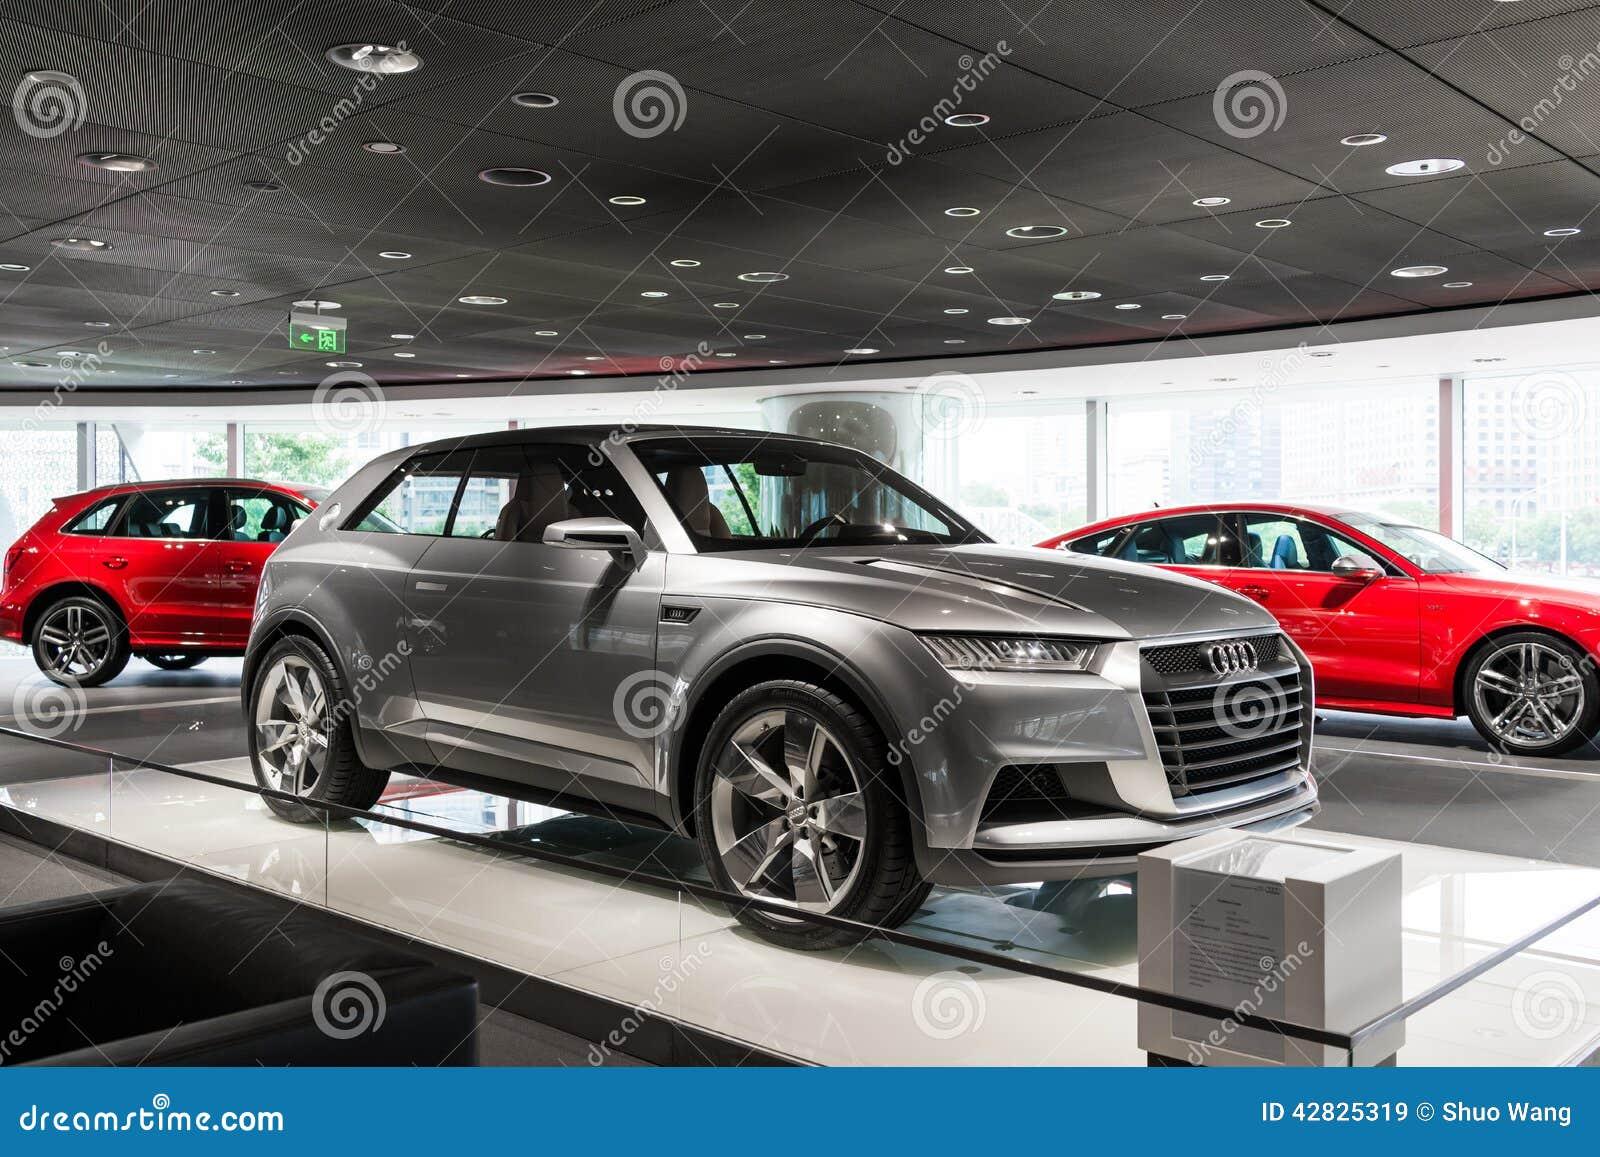 Audi garage editorial image 27276458 for Garage audi pau